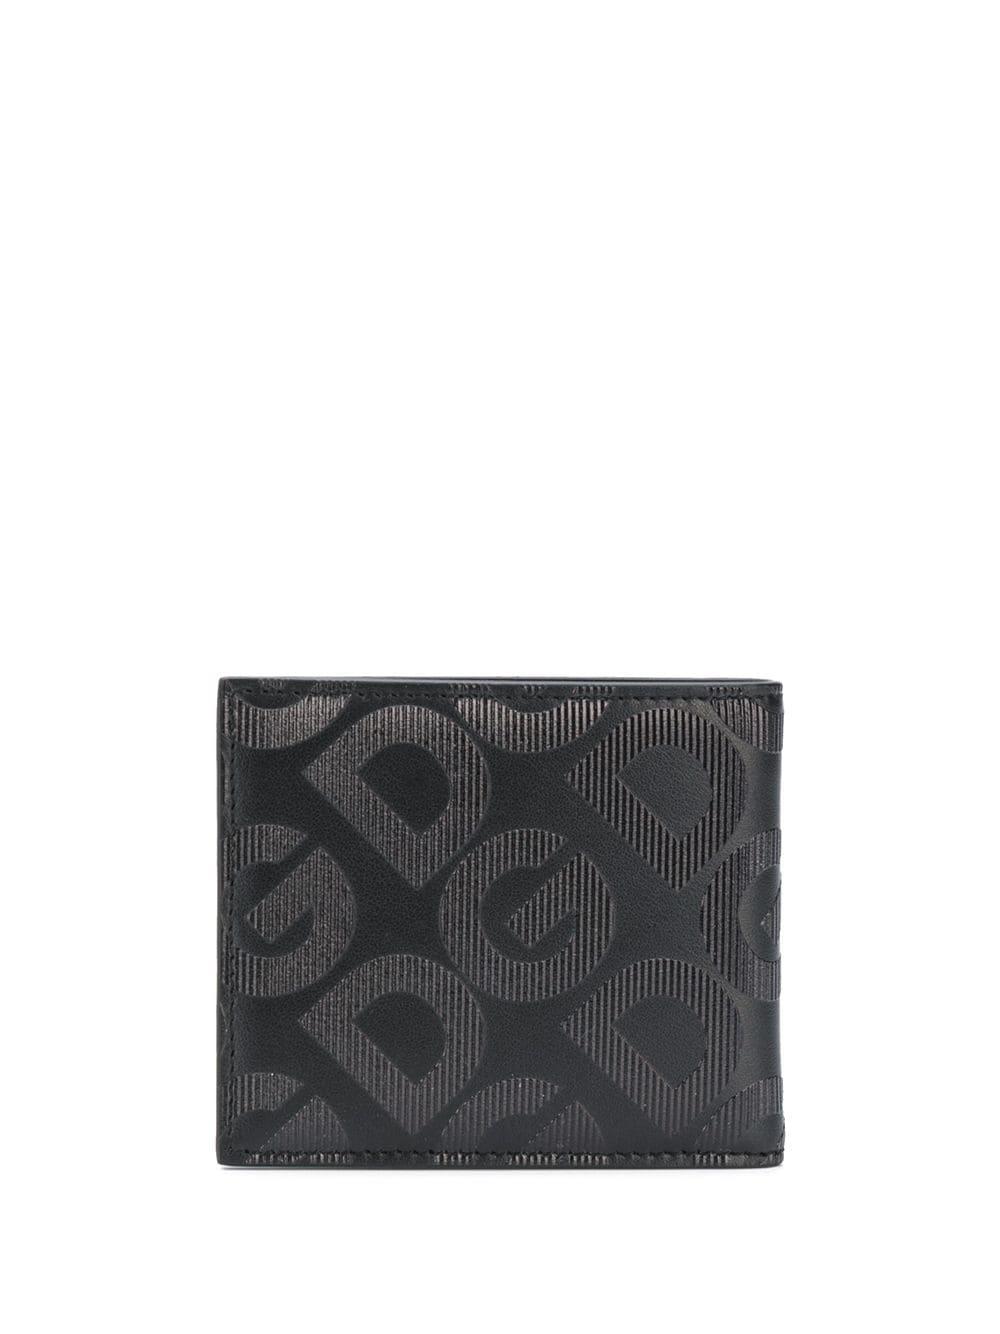 black calf leather bi-fold wallet with grey DG Mania print DOLCE & GABBANA |  | BP1321-AJ690HNNDN